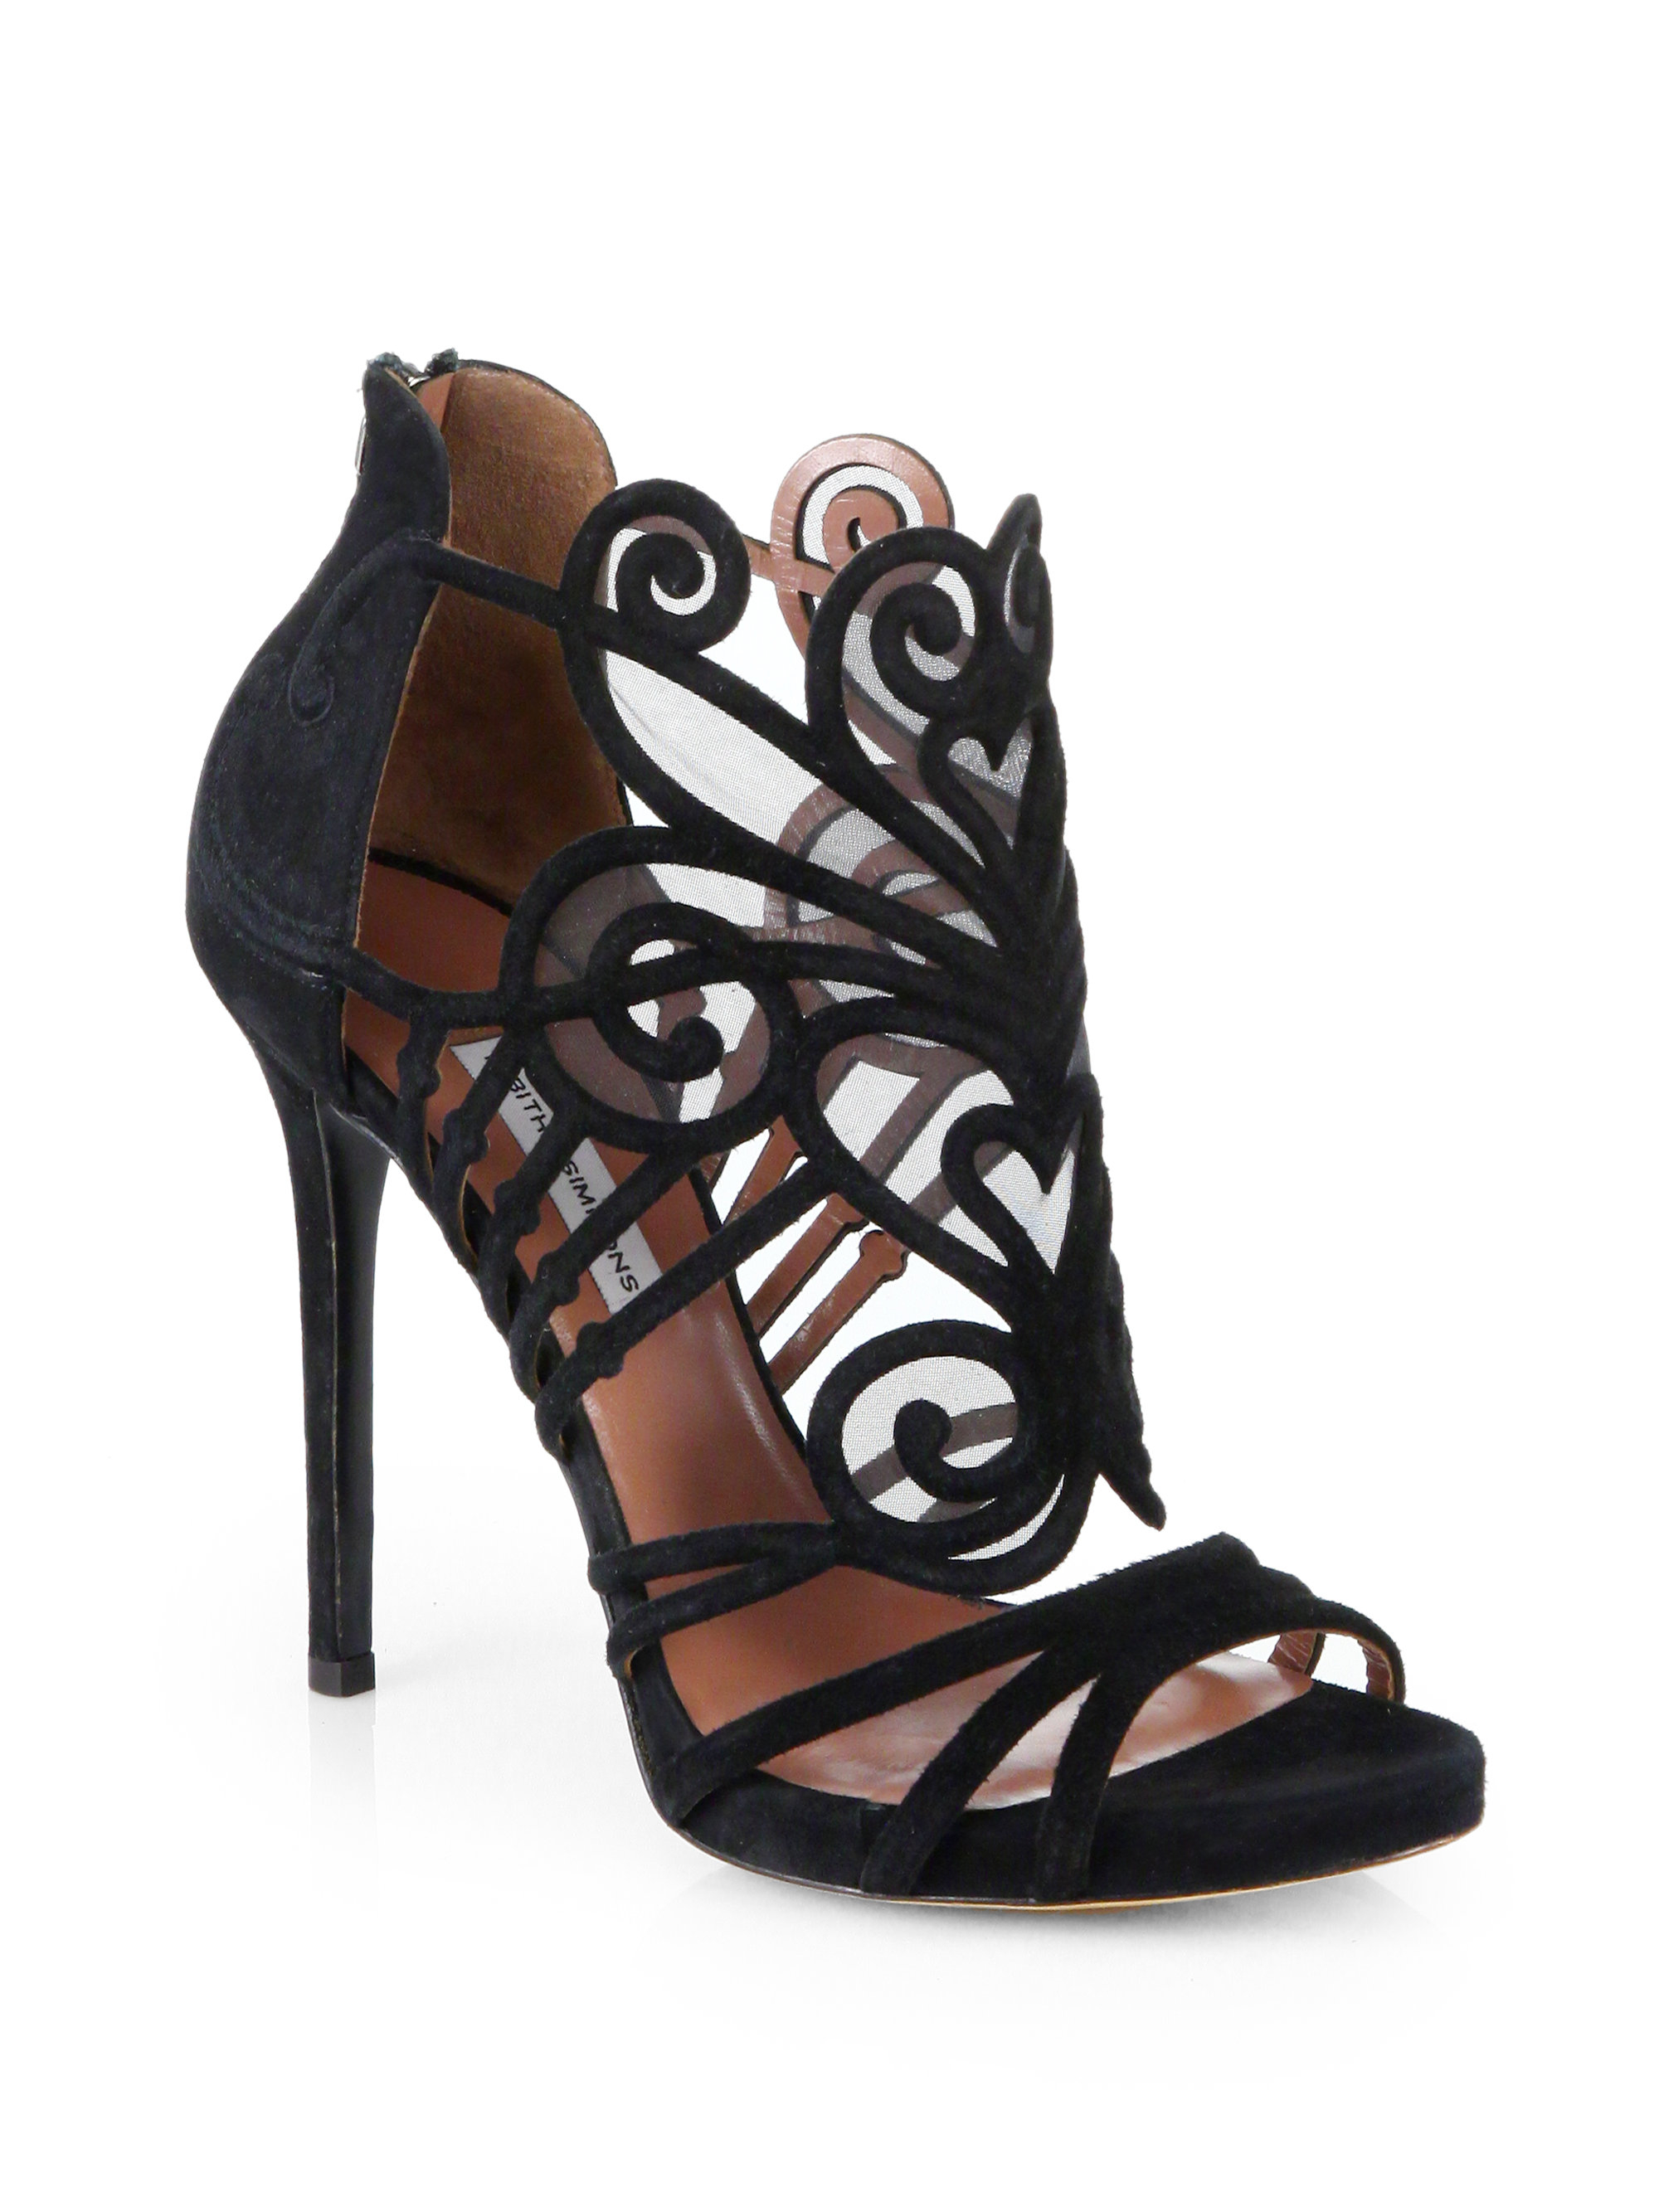 Tabitha Simmons Aura Suede Amp Mesh Platform Sandals In